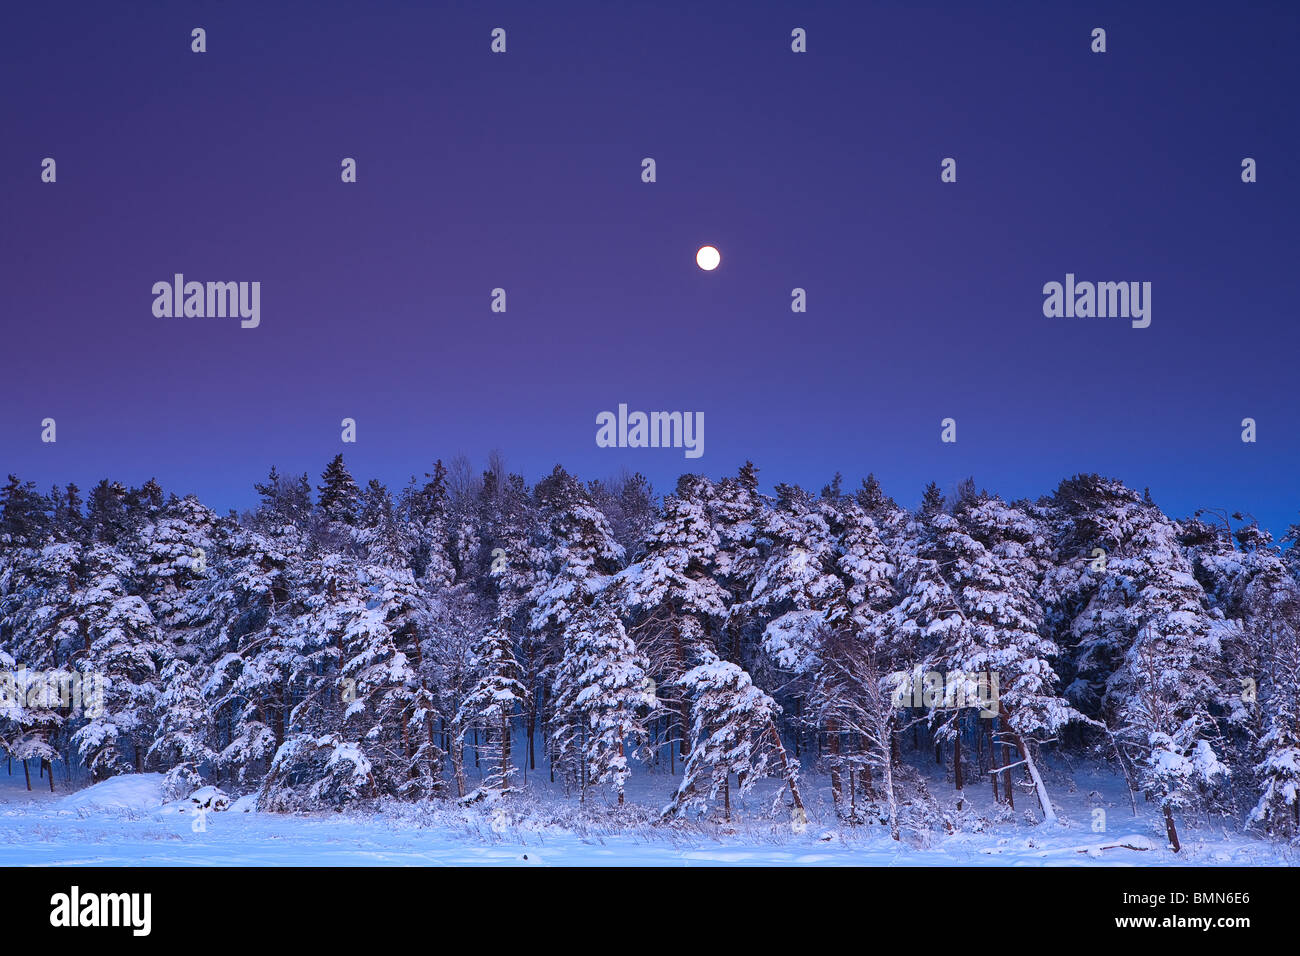 Moonrise at Larkollen in Rygge kommune, Østfold fylke, Norway. - Stock Image